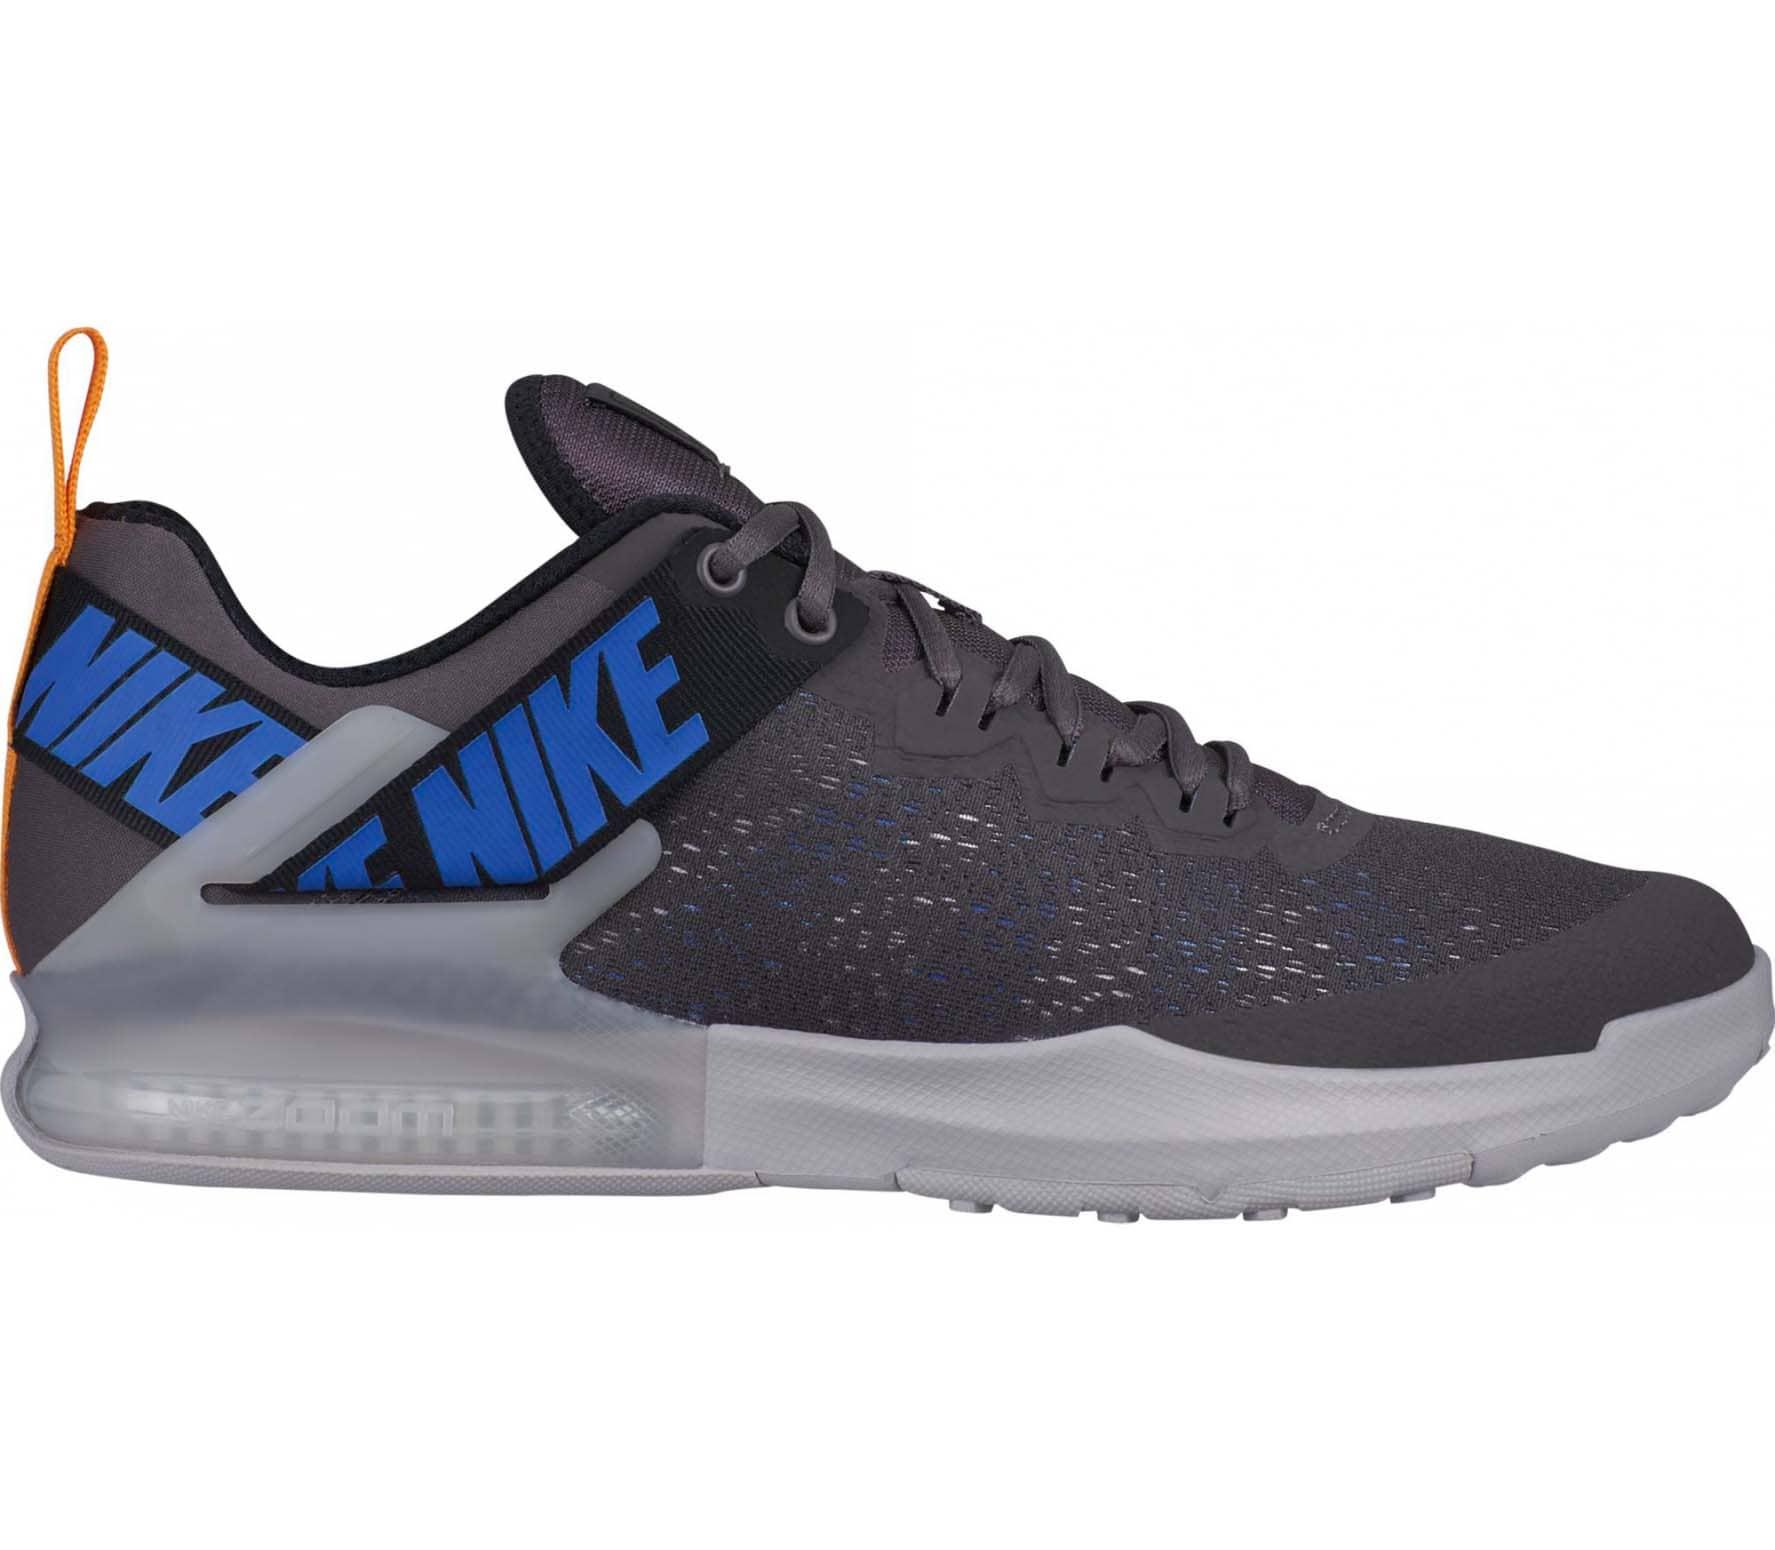 Tenis Nike Domination - Ao4403-005